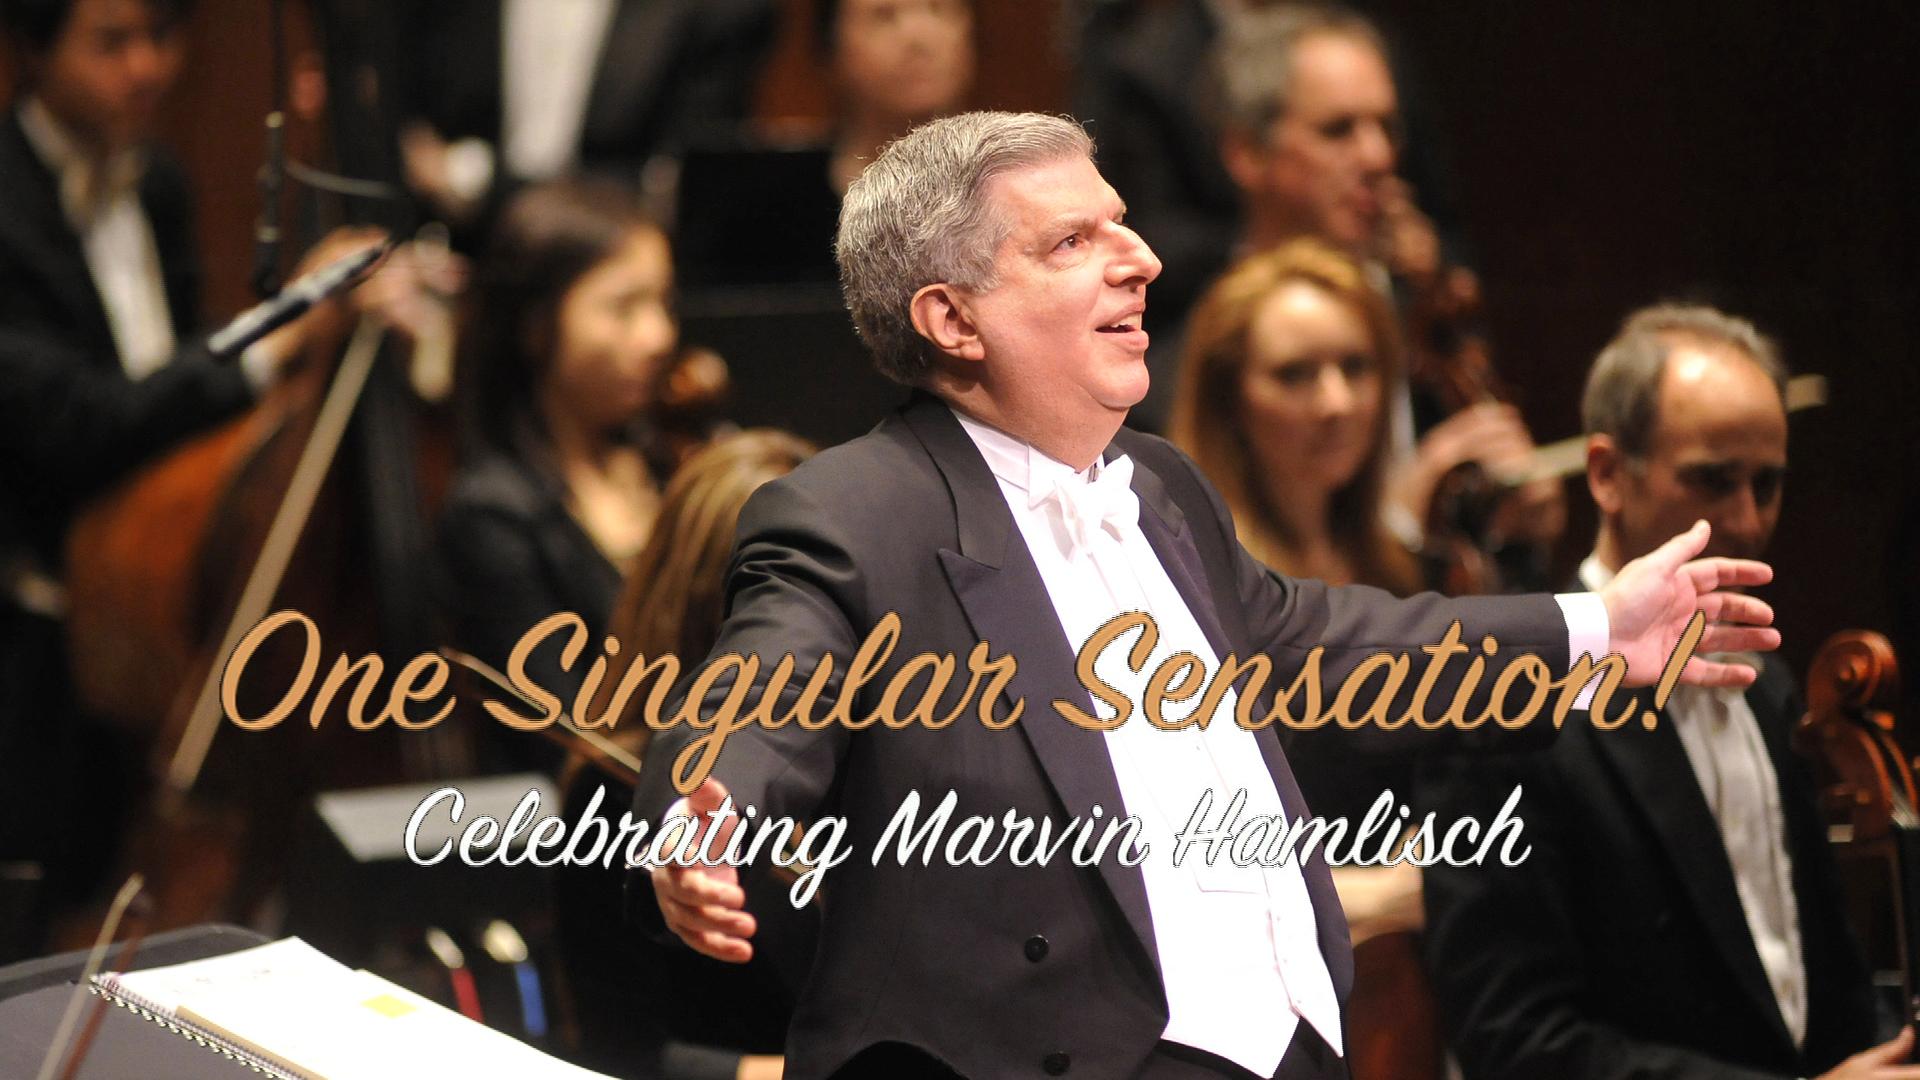 One Singular Sensation! Celebrating Marvin Hamlisch image